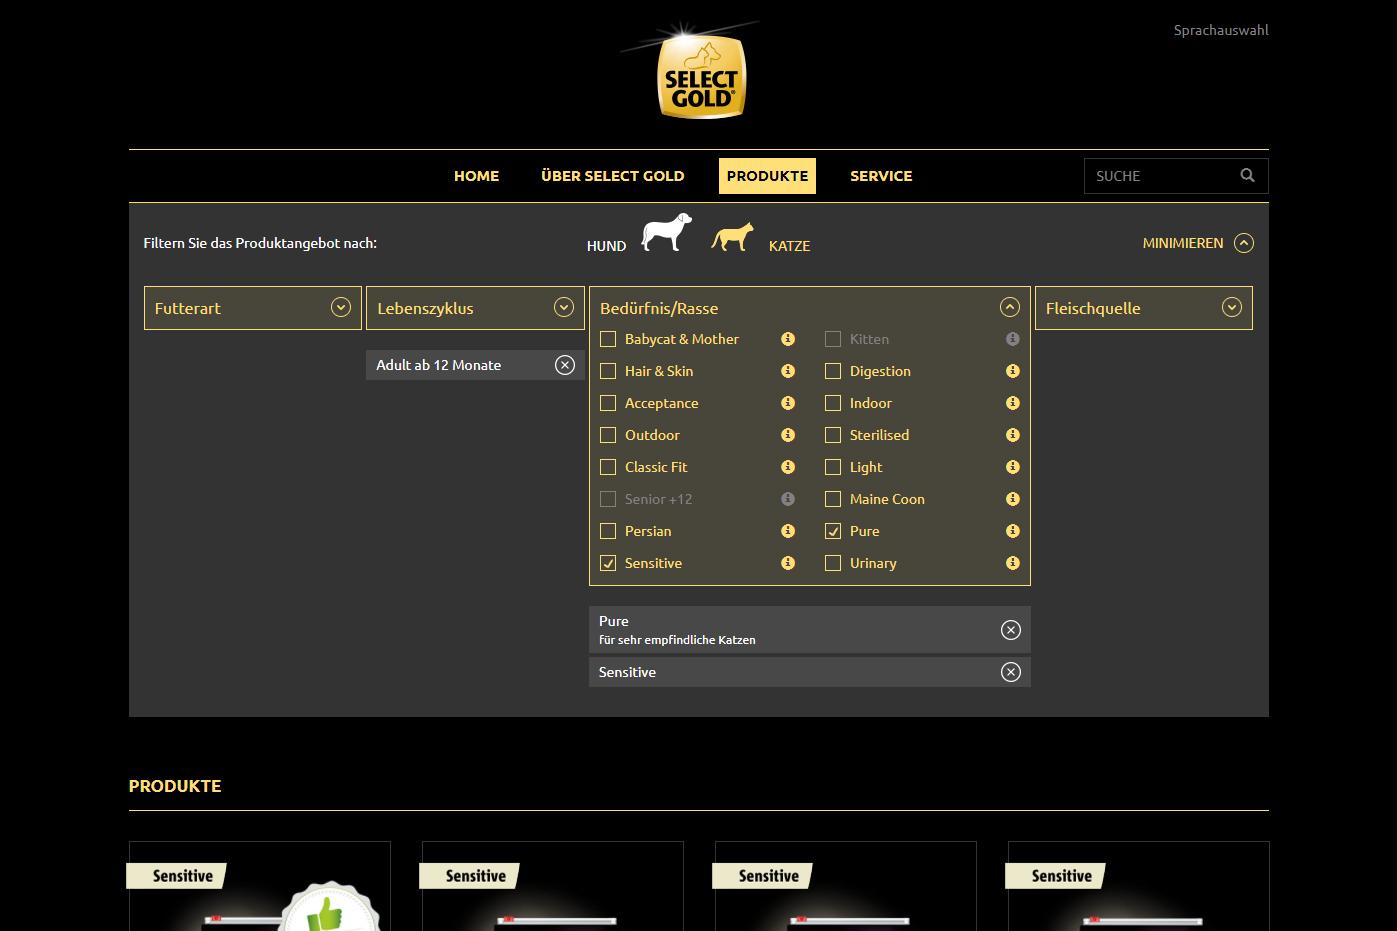 Fensterkatzen_Getestet_Select-Gold-Fressnapf_Screenschot-Produktfinder